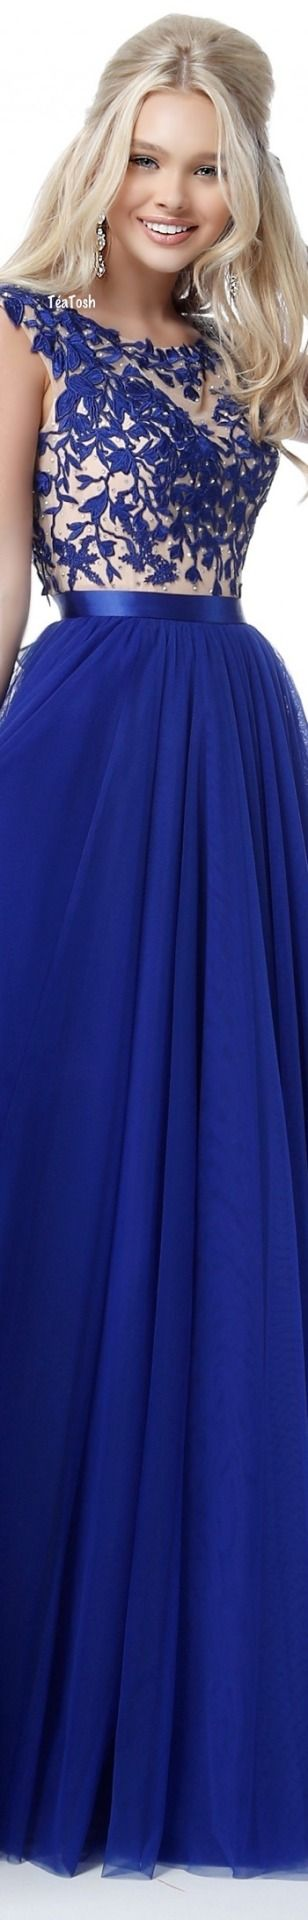 ❇Téa Tosh❇ SHERRI HILL | BLUE CHRISTMAS2 | Pinterest | Azul marino ...